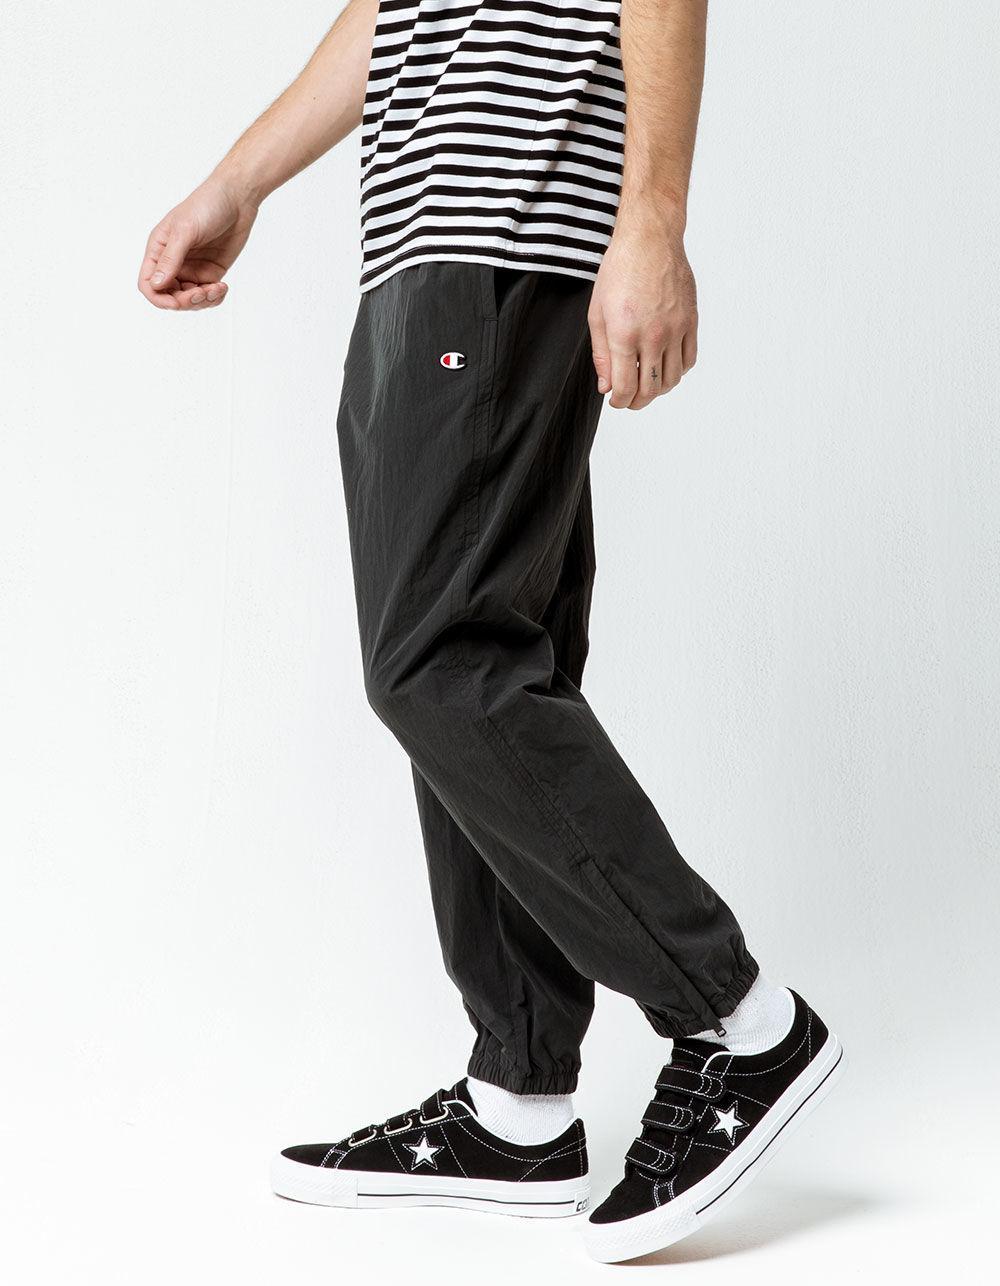 8998594c7db1 Lyst - Champion C Life Mens Track Pants in Black for Men